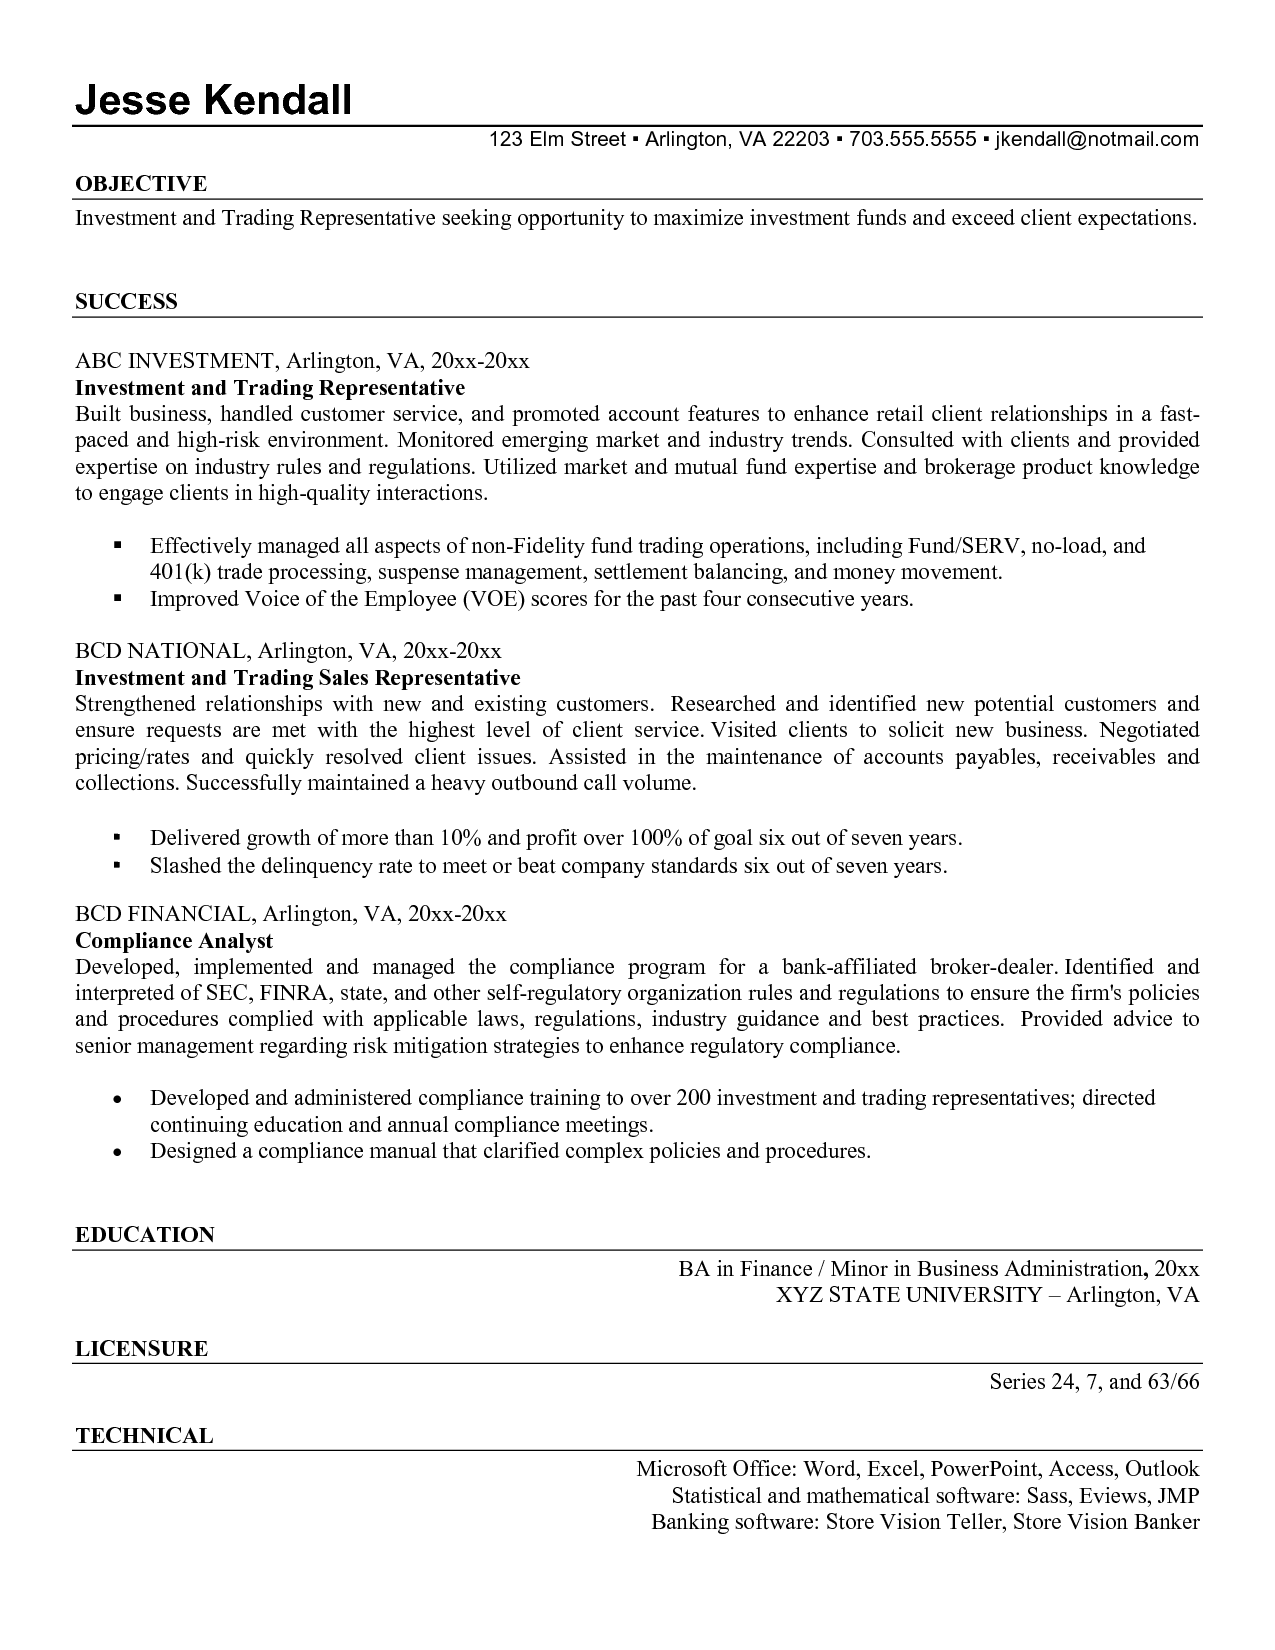 proprietary trading resume example resumecareer info proprietary trading resume example resumecareer info proprietary